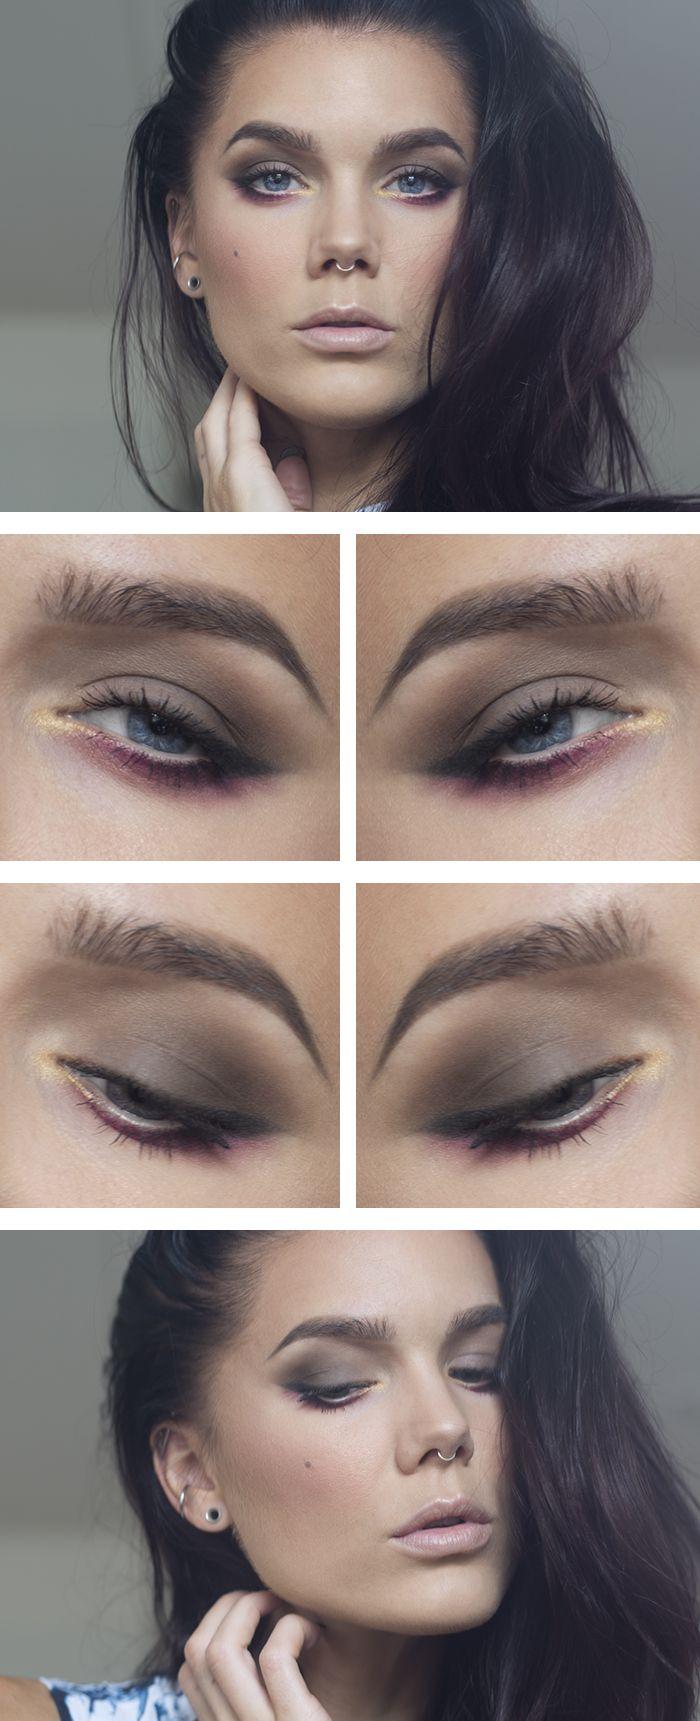 31juli MAC eyeshadow quad Maleficent MUS Lippencil Road trip Oriflame the one mascara MAC lisptick japanese maple NARS blush Orgasm Anastasia Contour kit